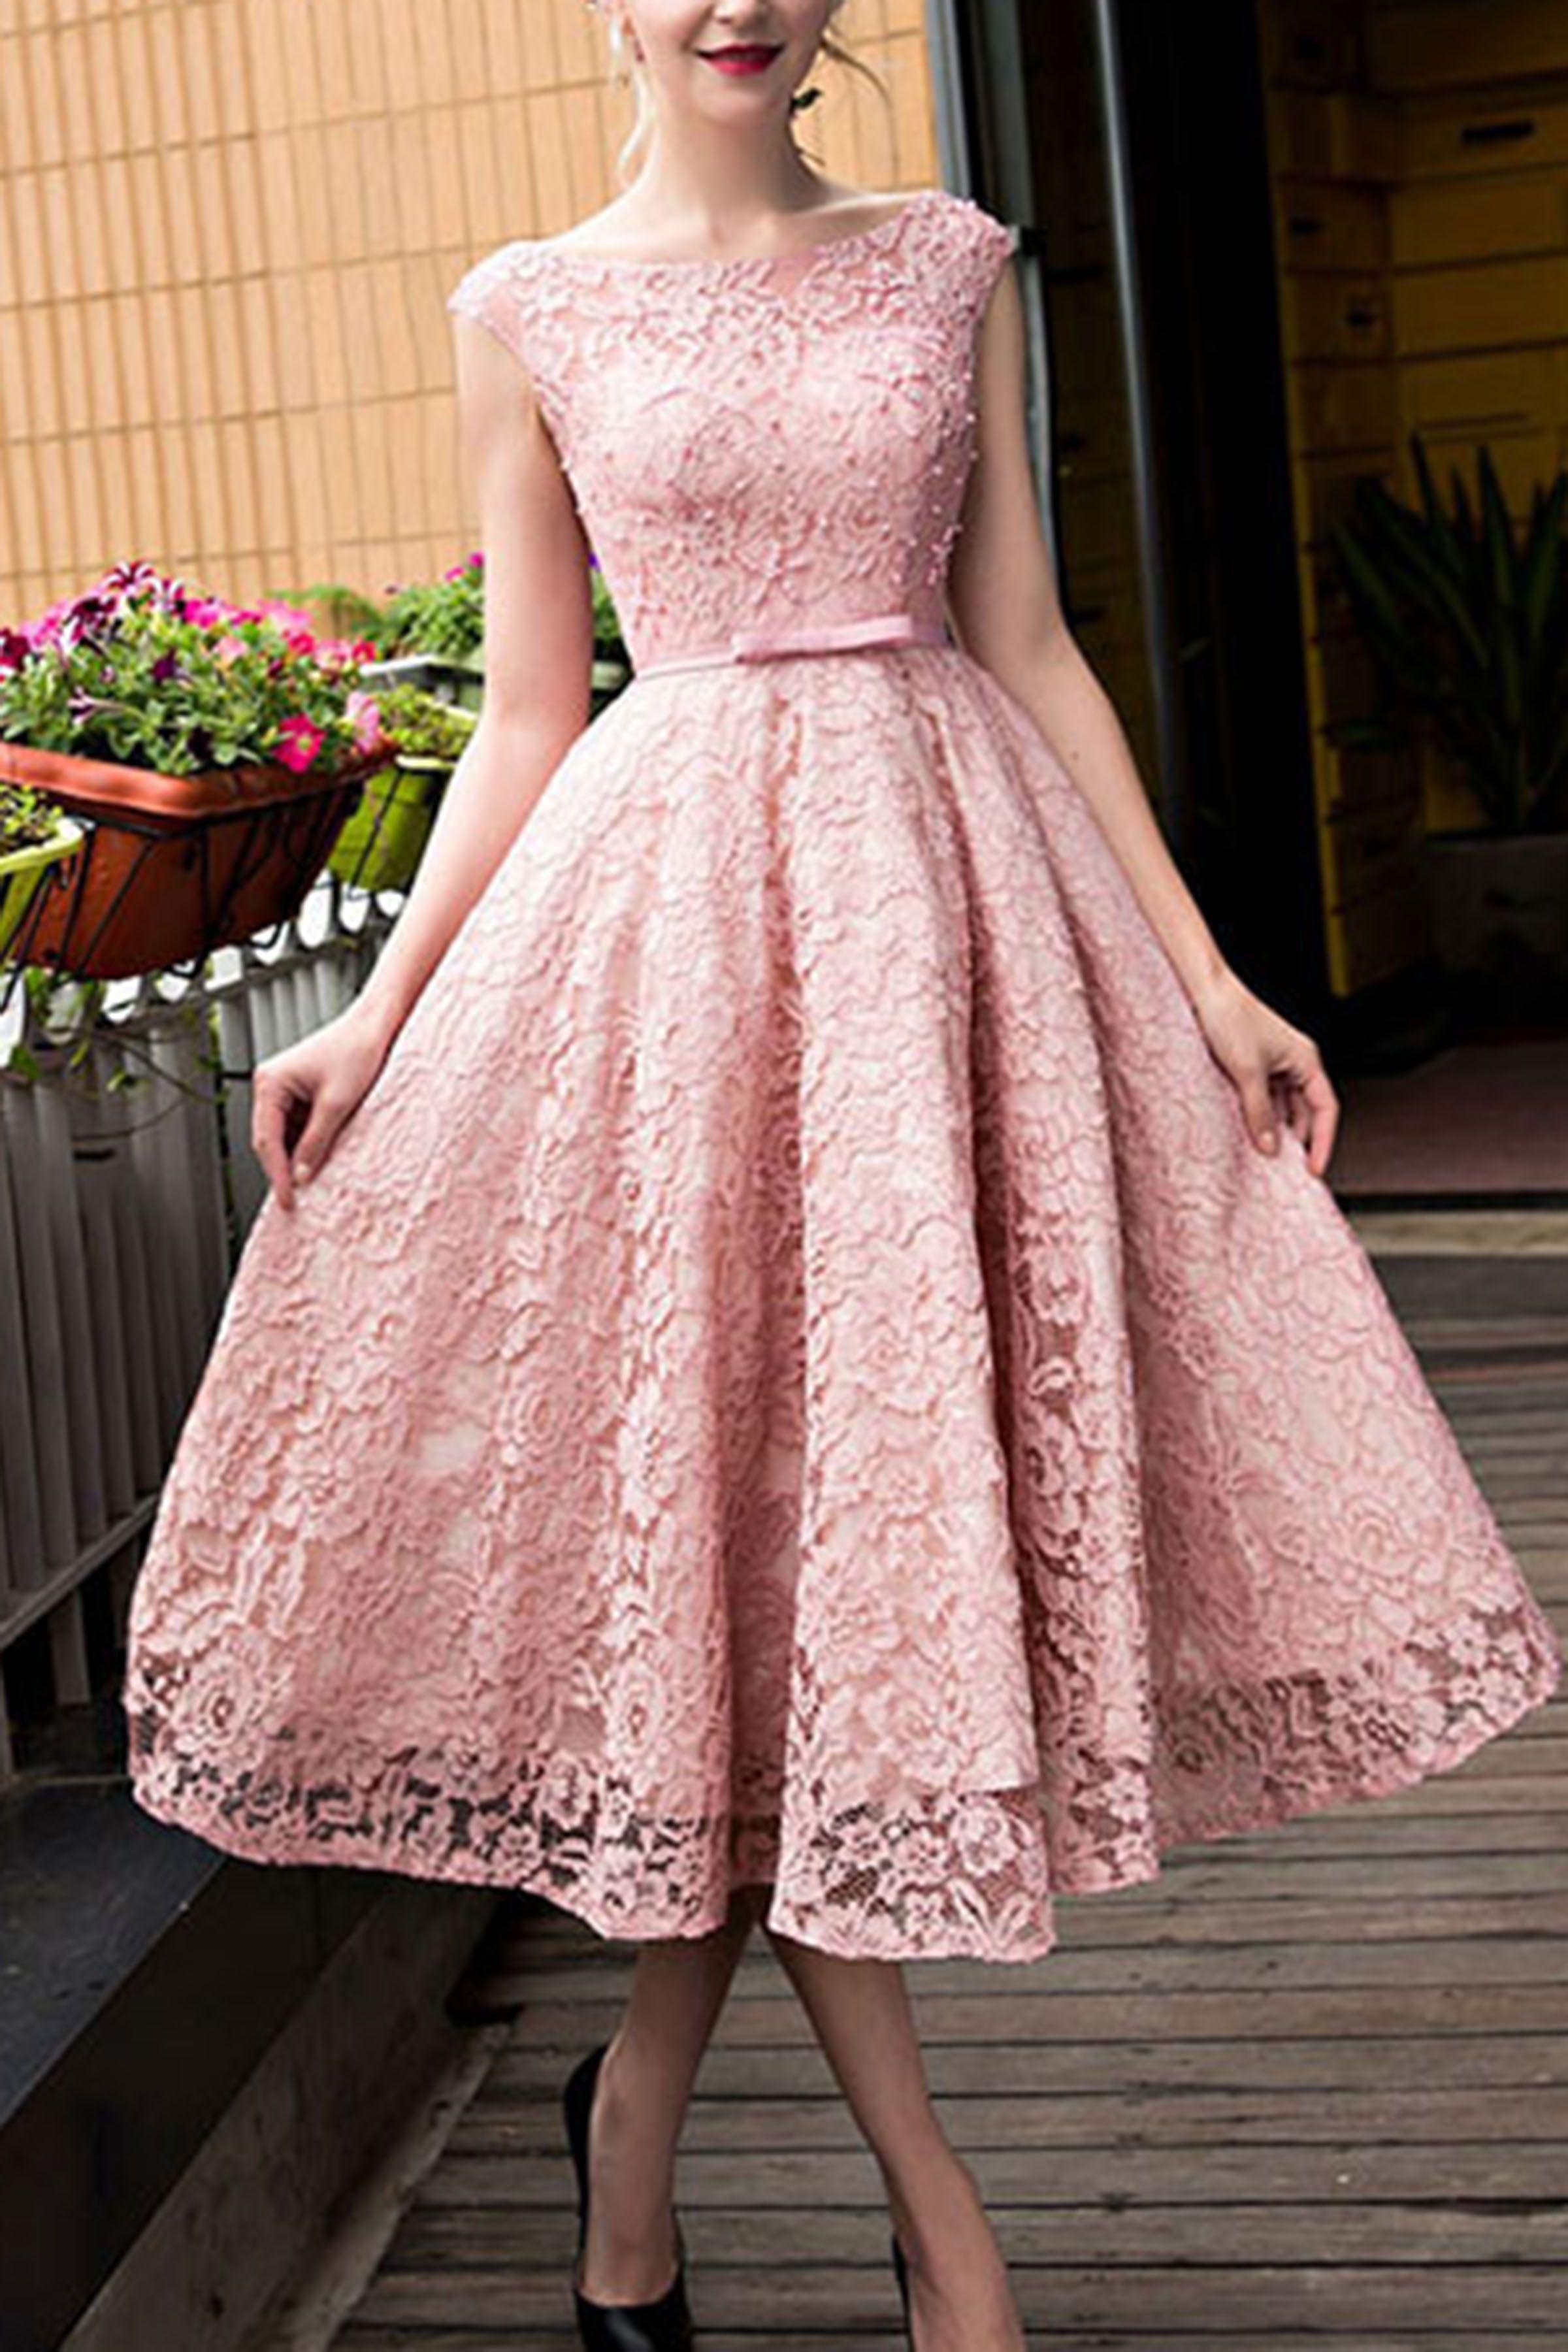 Cute short wedding dresses  Lace prom dress fashion prom dress cute pink lace short prom dress